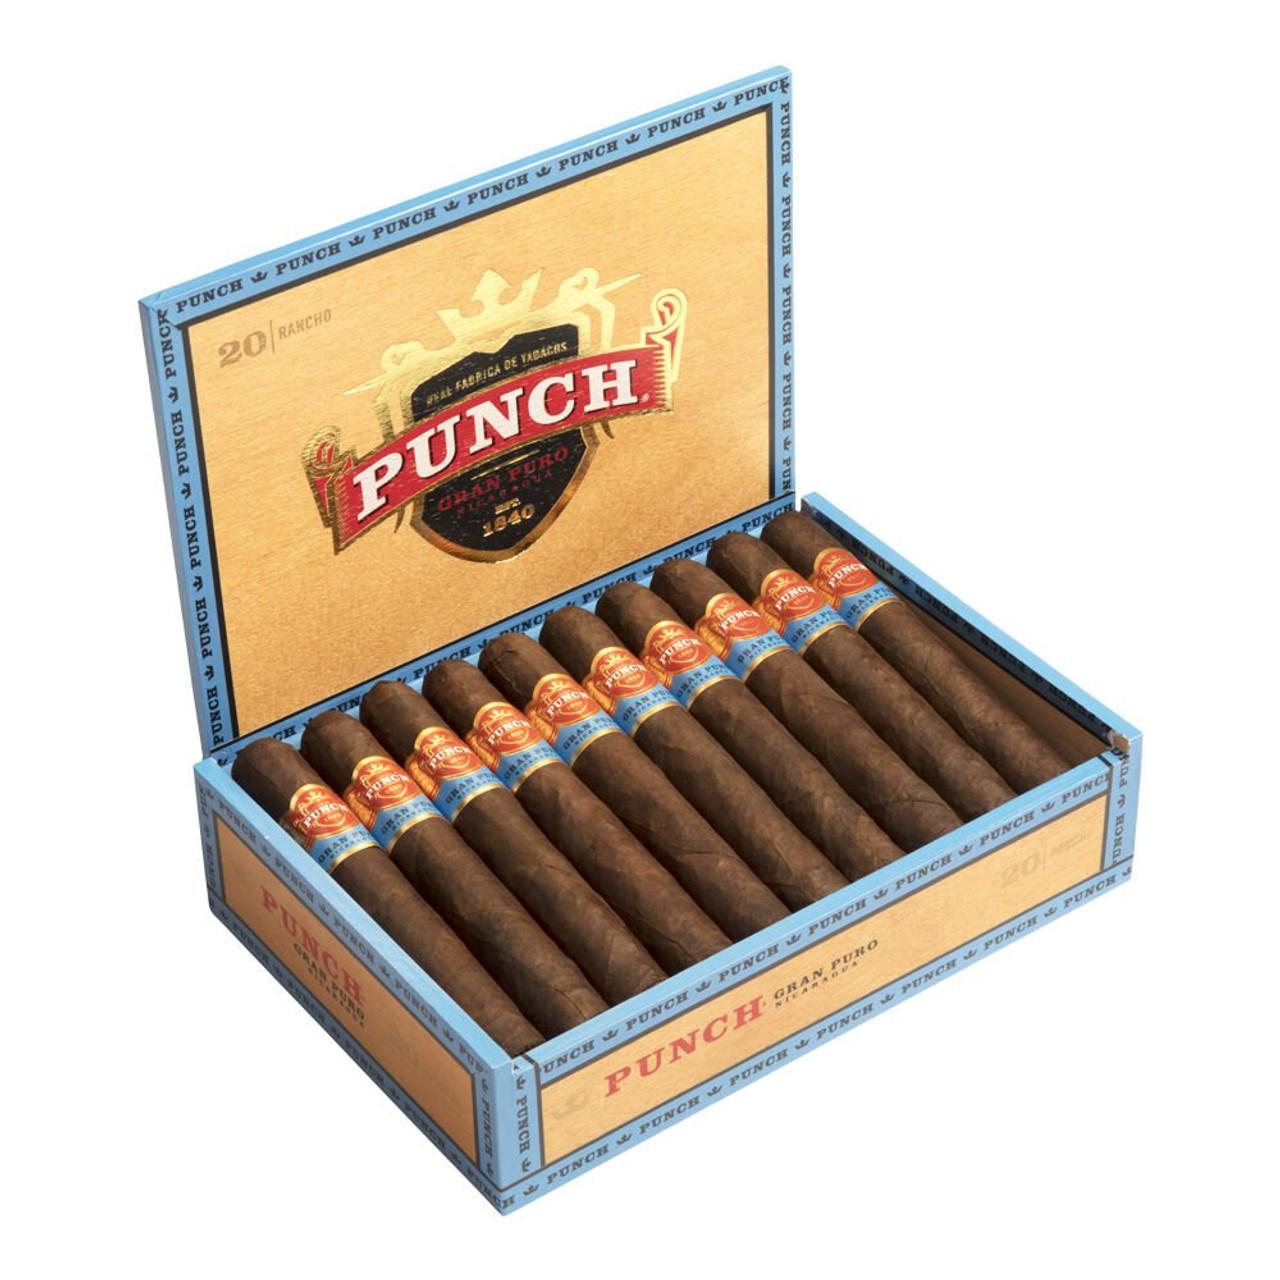 Punch Gran Puro Nicaragua Cigars - 7.5 x 54 (Box of 20)